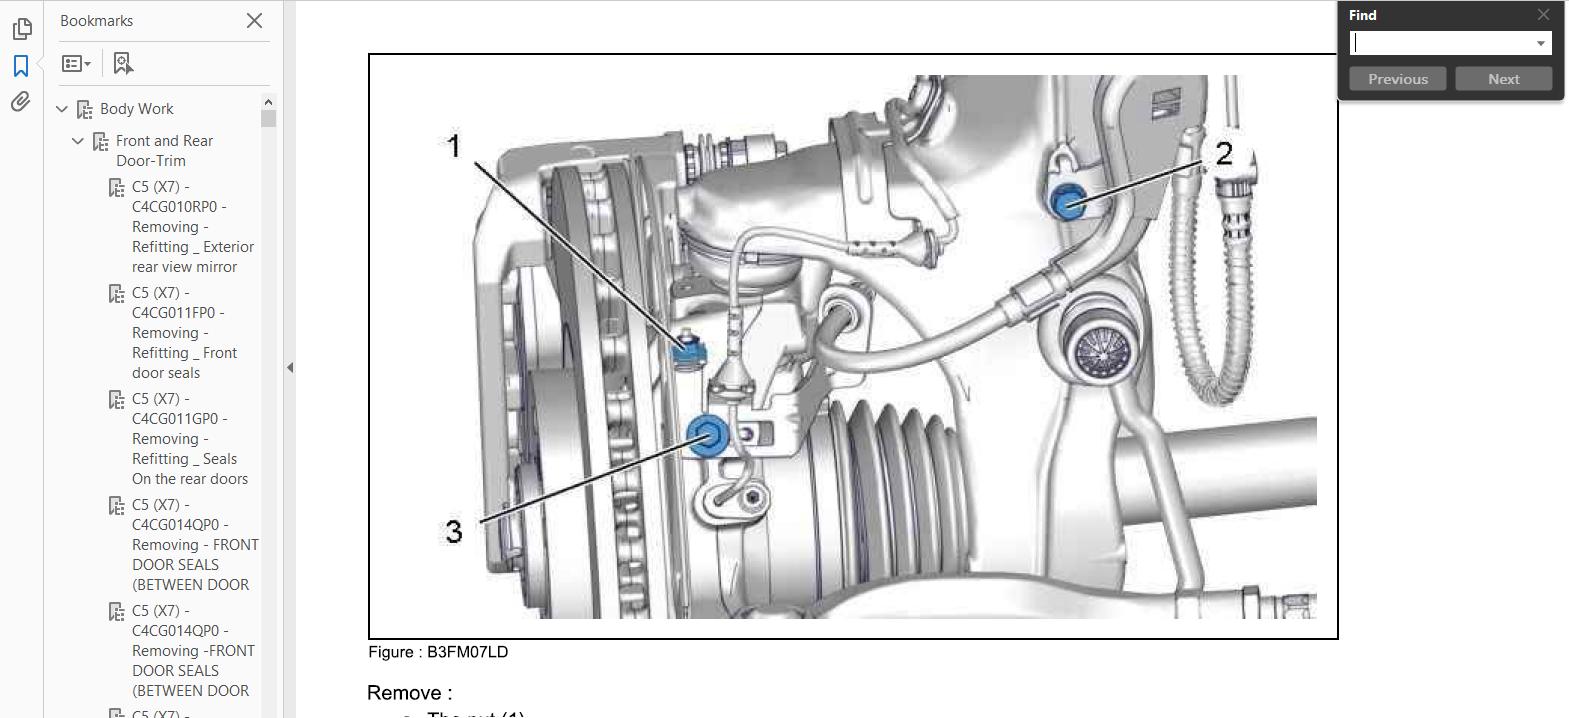 Official Workshop Manual Service Repair Citroen C5 Iii 2007 2015 C25 Wiring Diagram